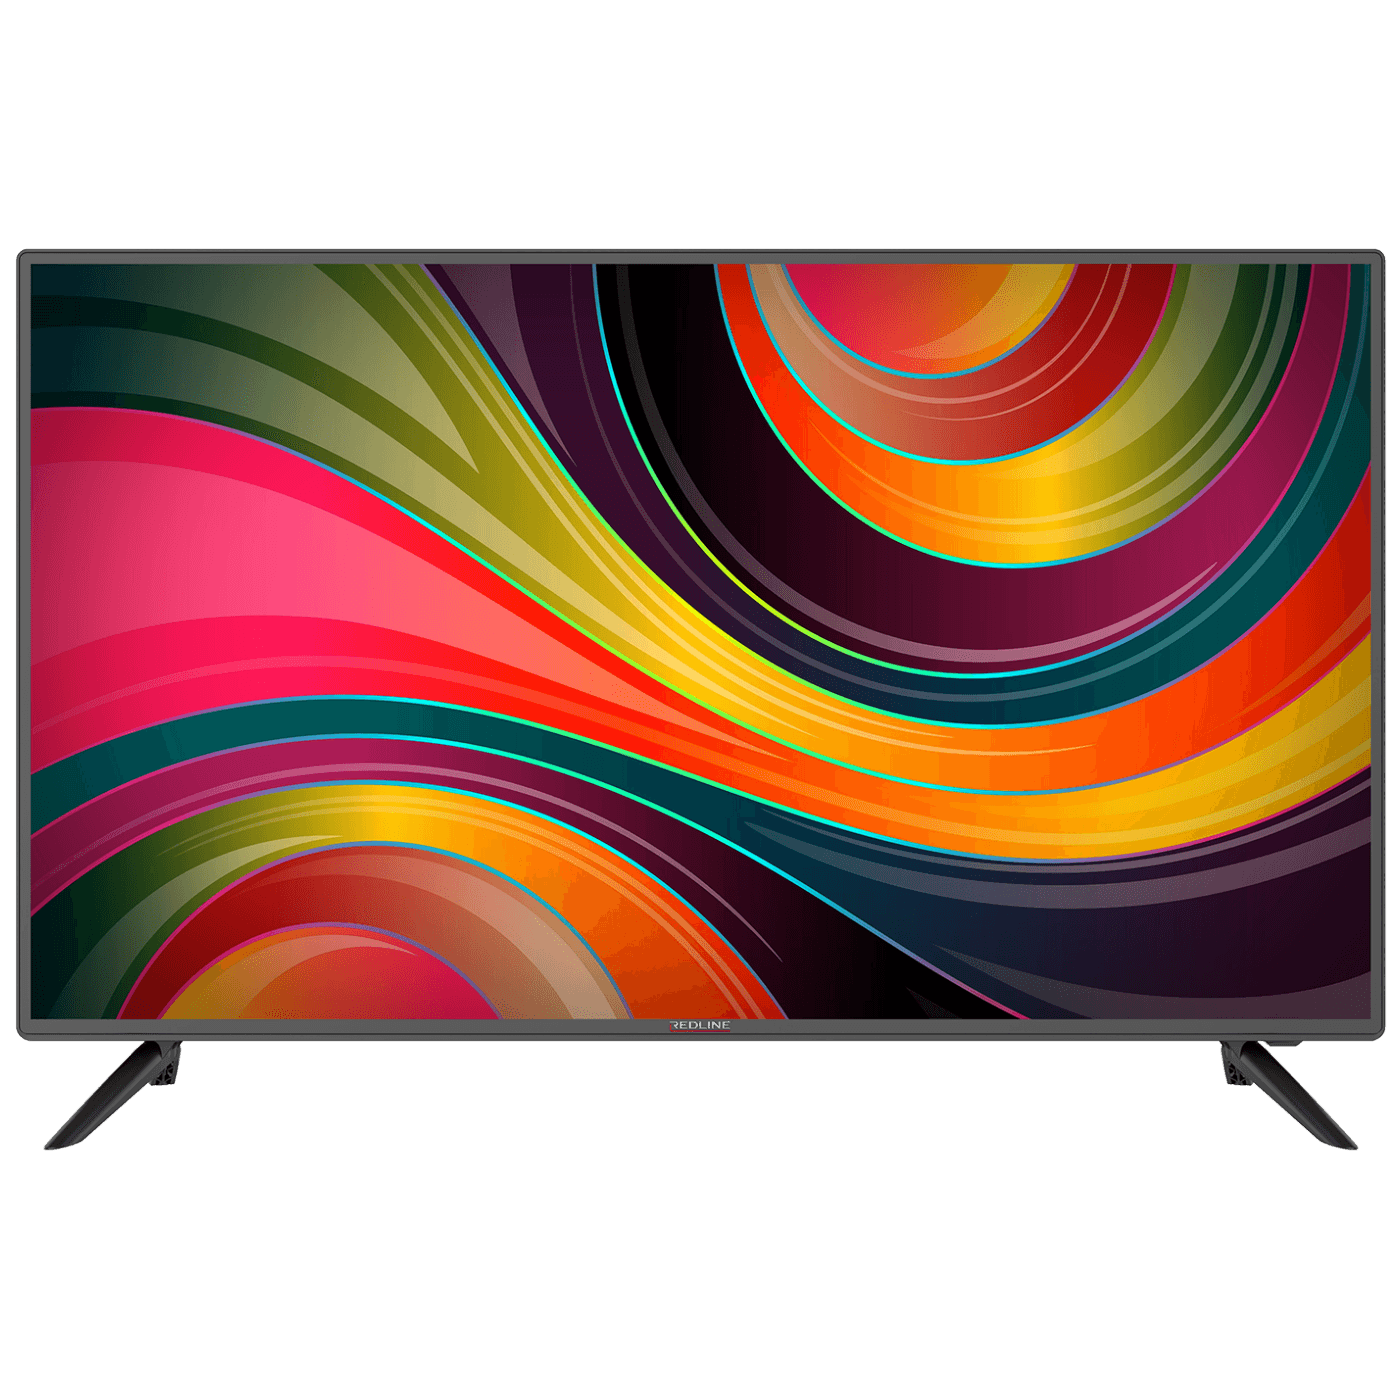 LED TV 43